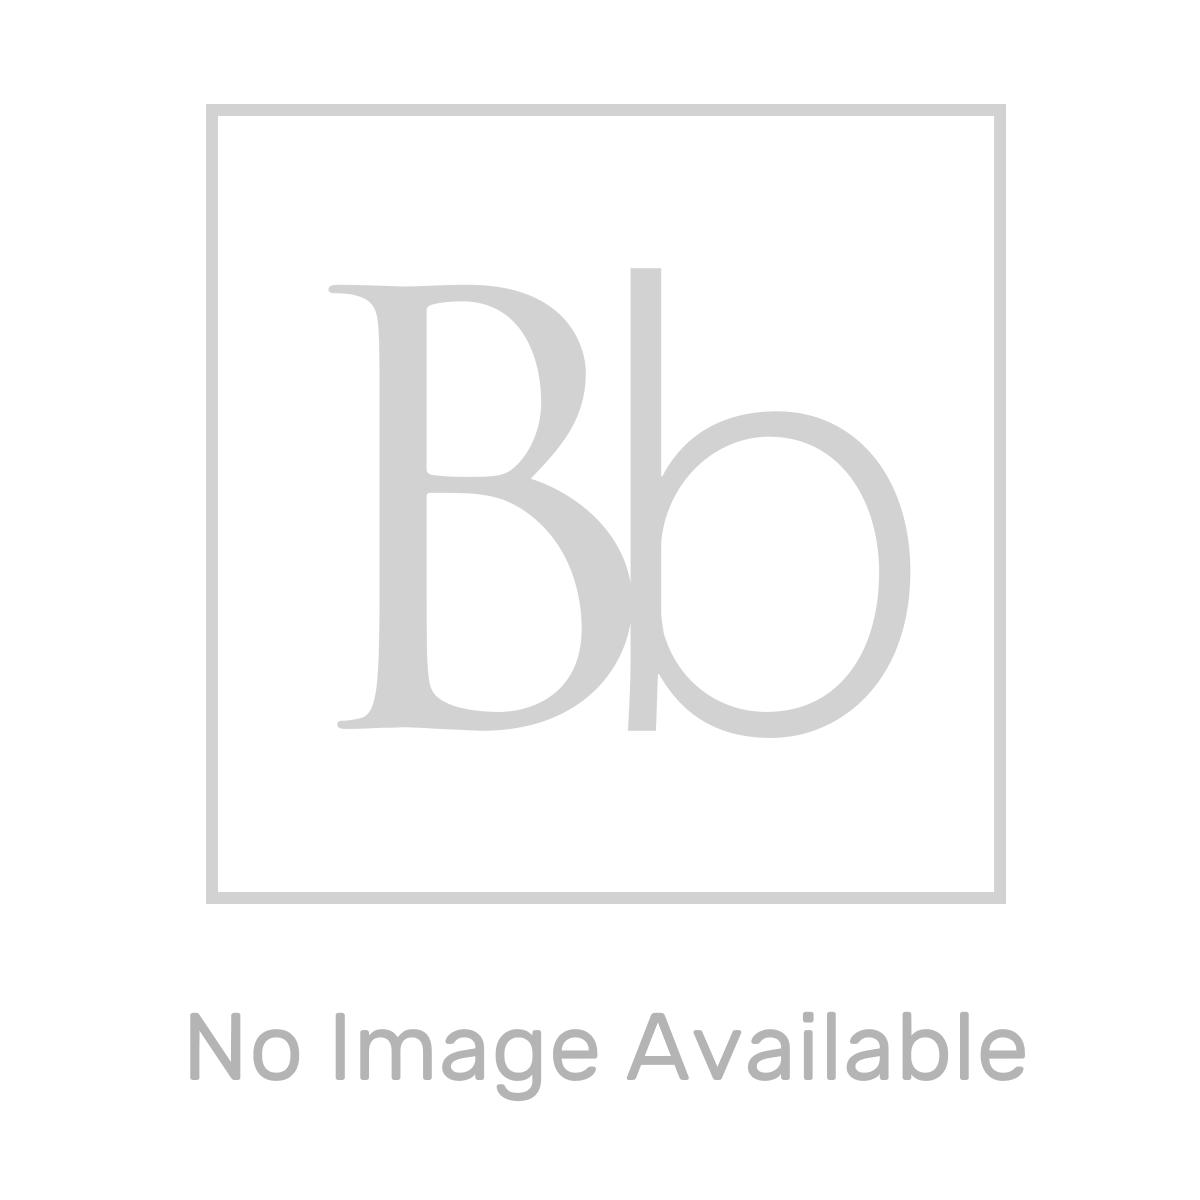 Kartell K-VIT Korsika Wall Hung Toilet with Soft Close Seat